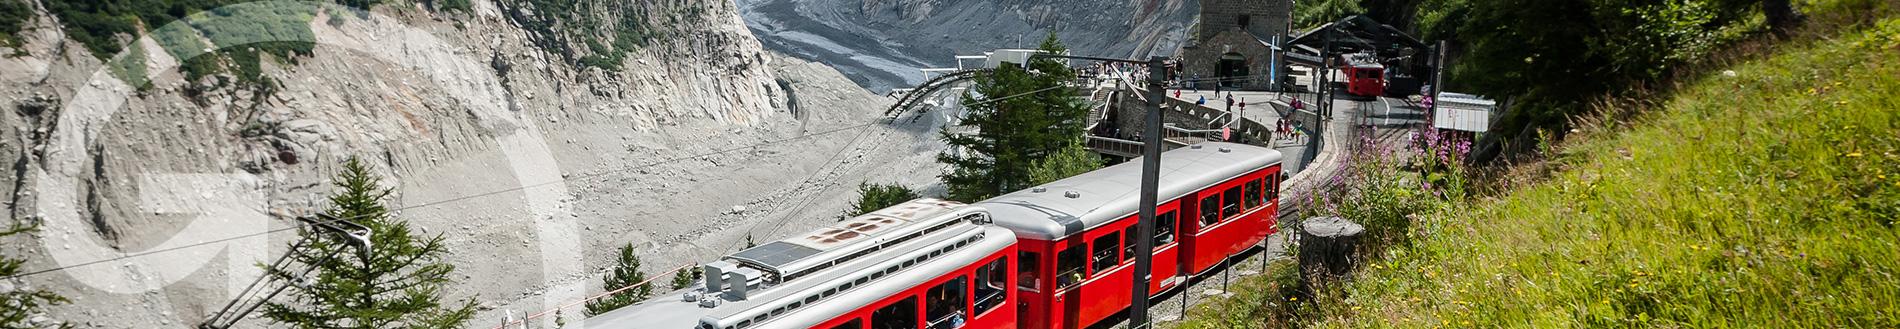 Chamonix train station Mer de Glace glacier MontBlanc Natural